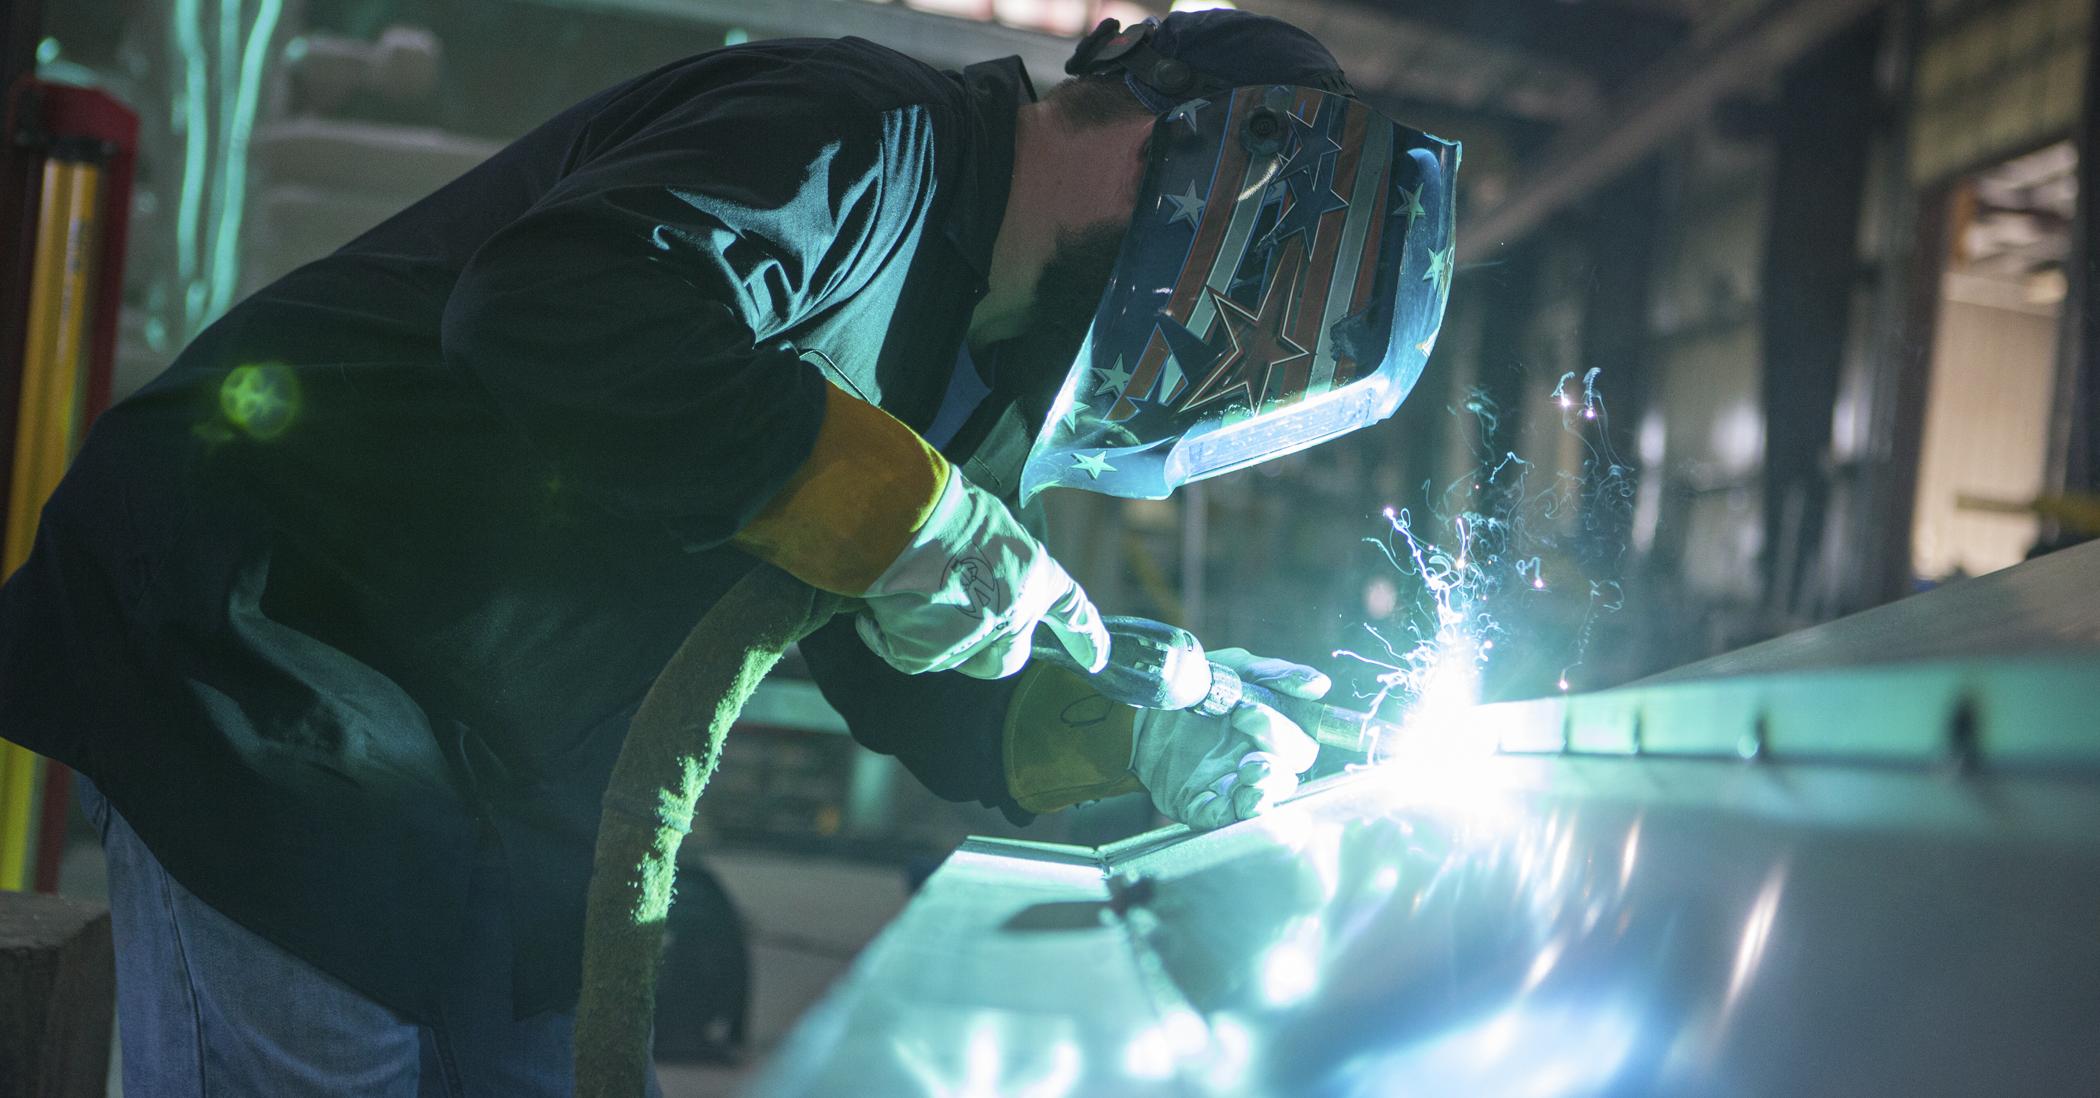 Metal Shark Boat being welded